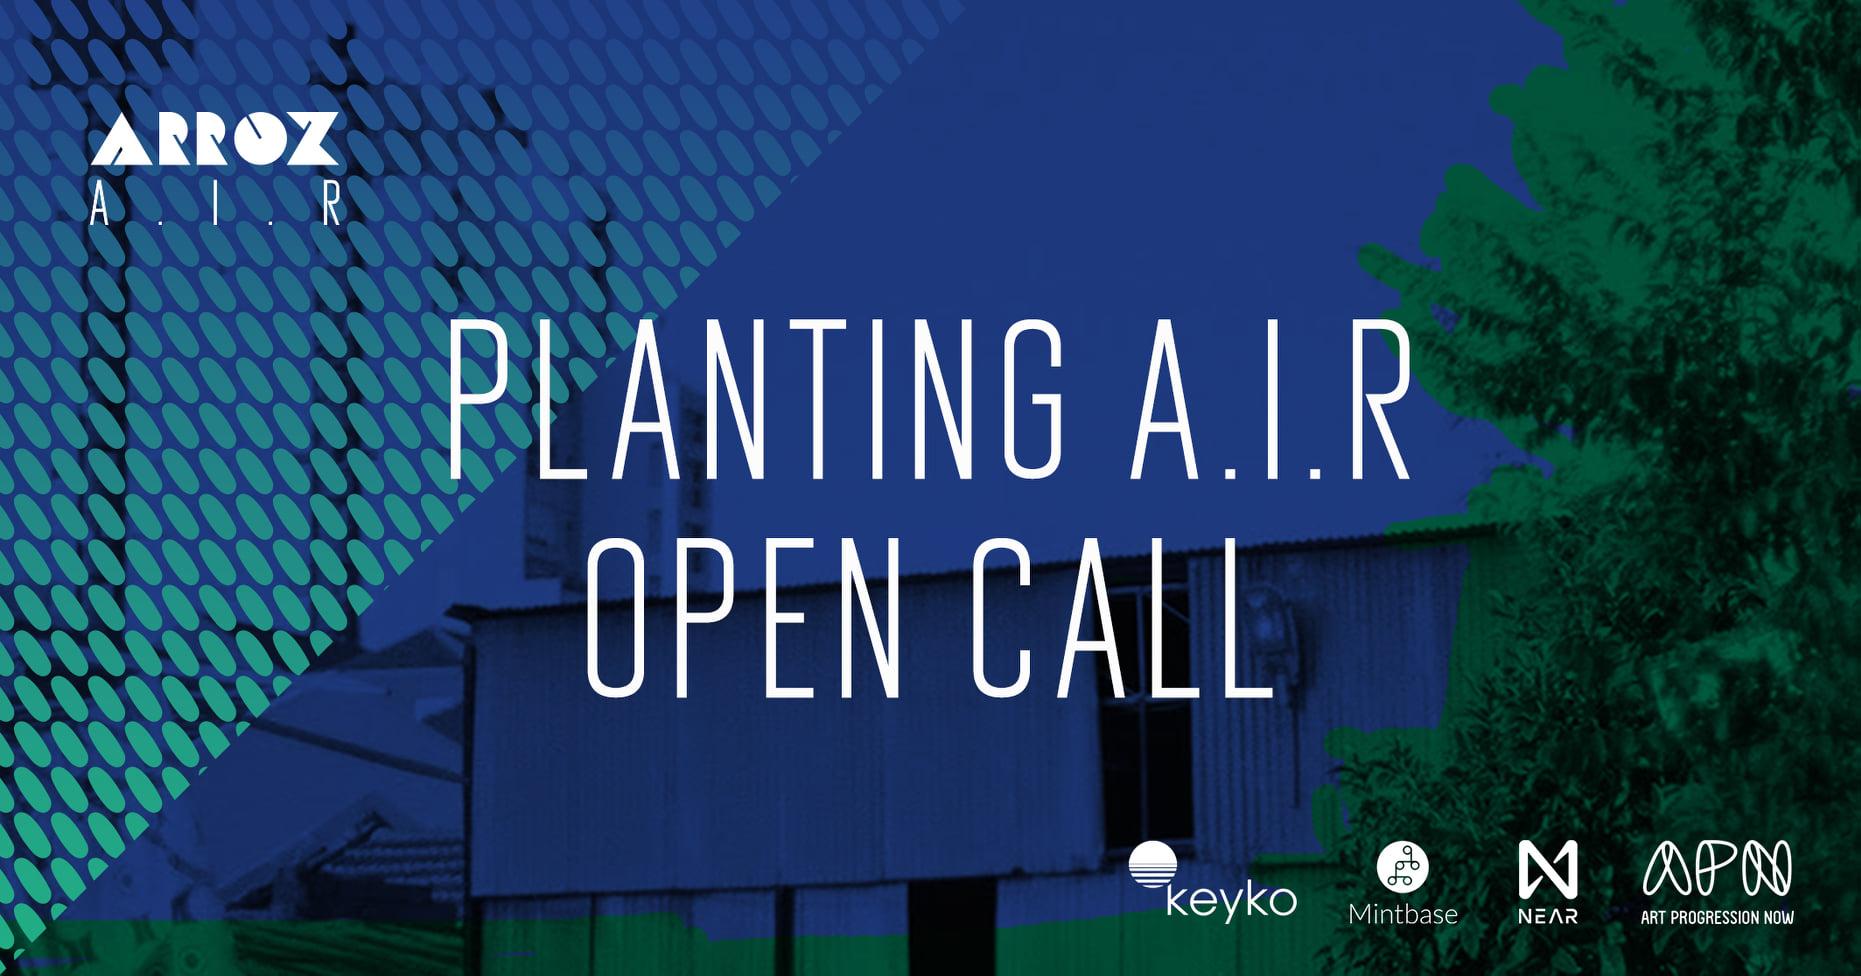 PLANTING A.I.R